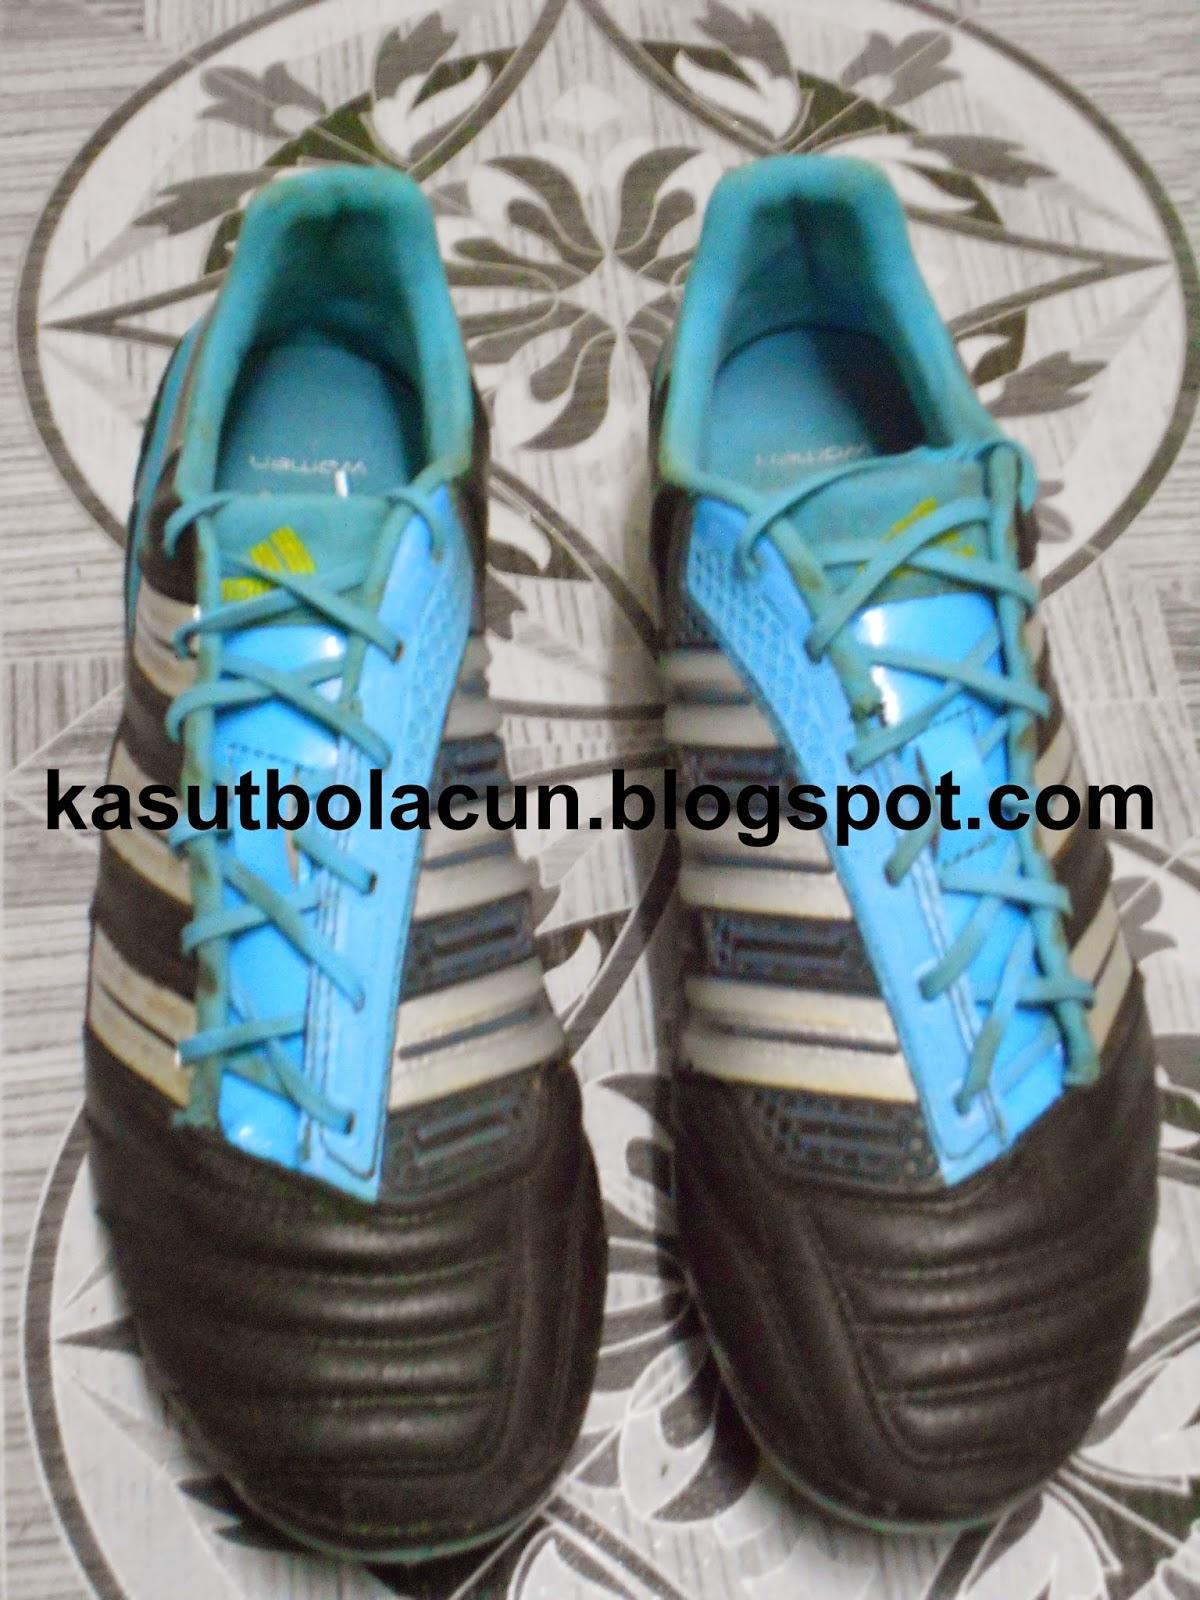 http://kasutbolacun.blogspot.com/2015/01/adidas-adipower-predator-fg.html